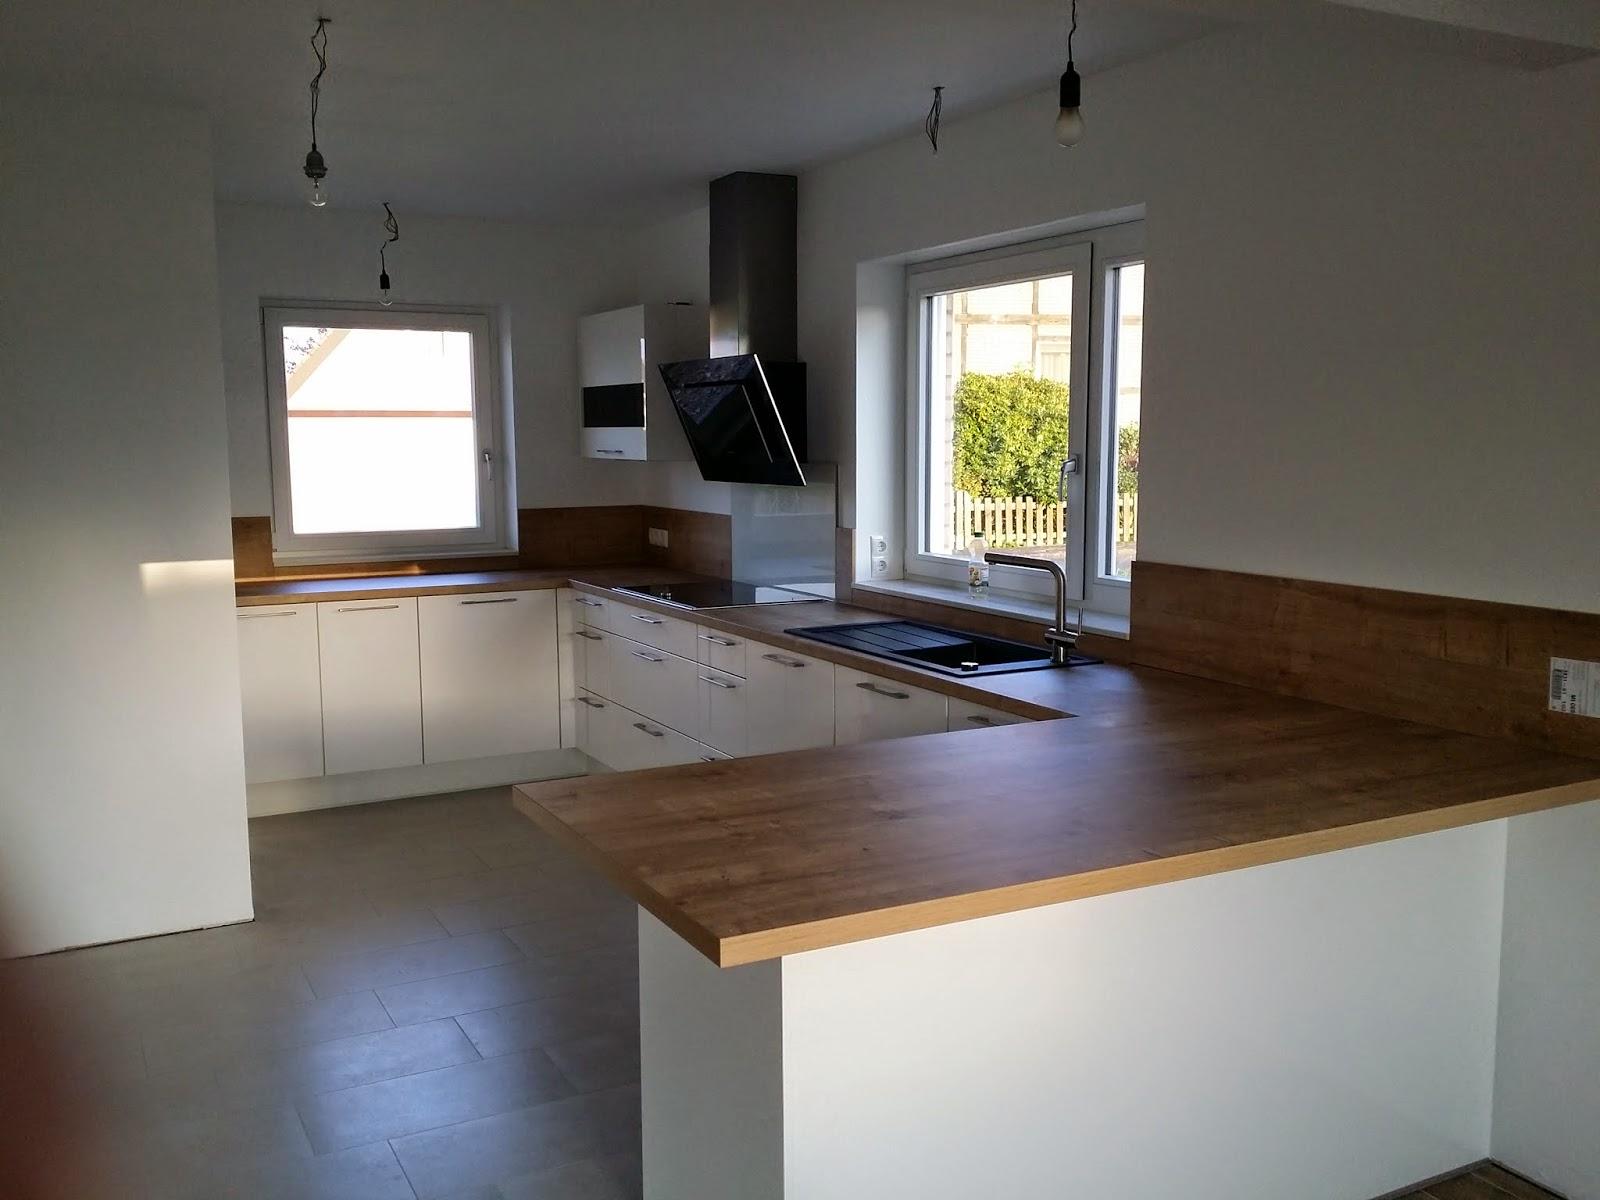 fliesen fur kuche magnolia alle ideen ber home design. Black Bedroom Furniture Sets. Home Design Ideas